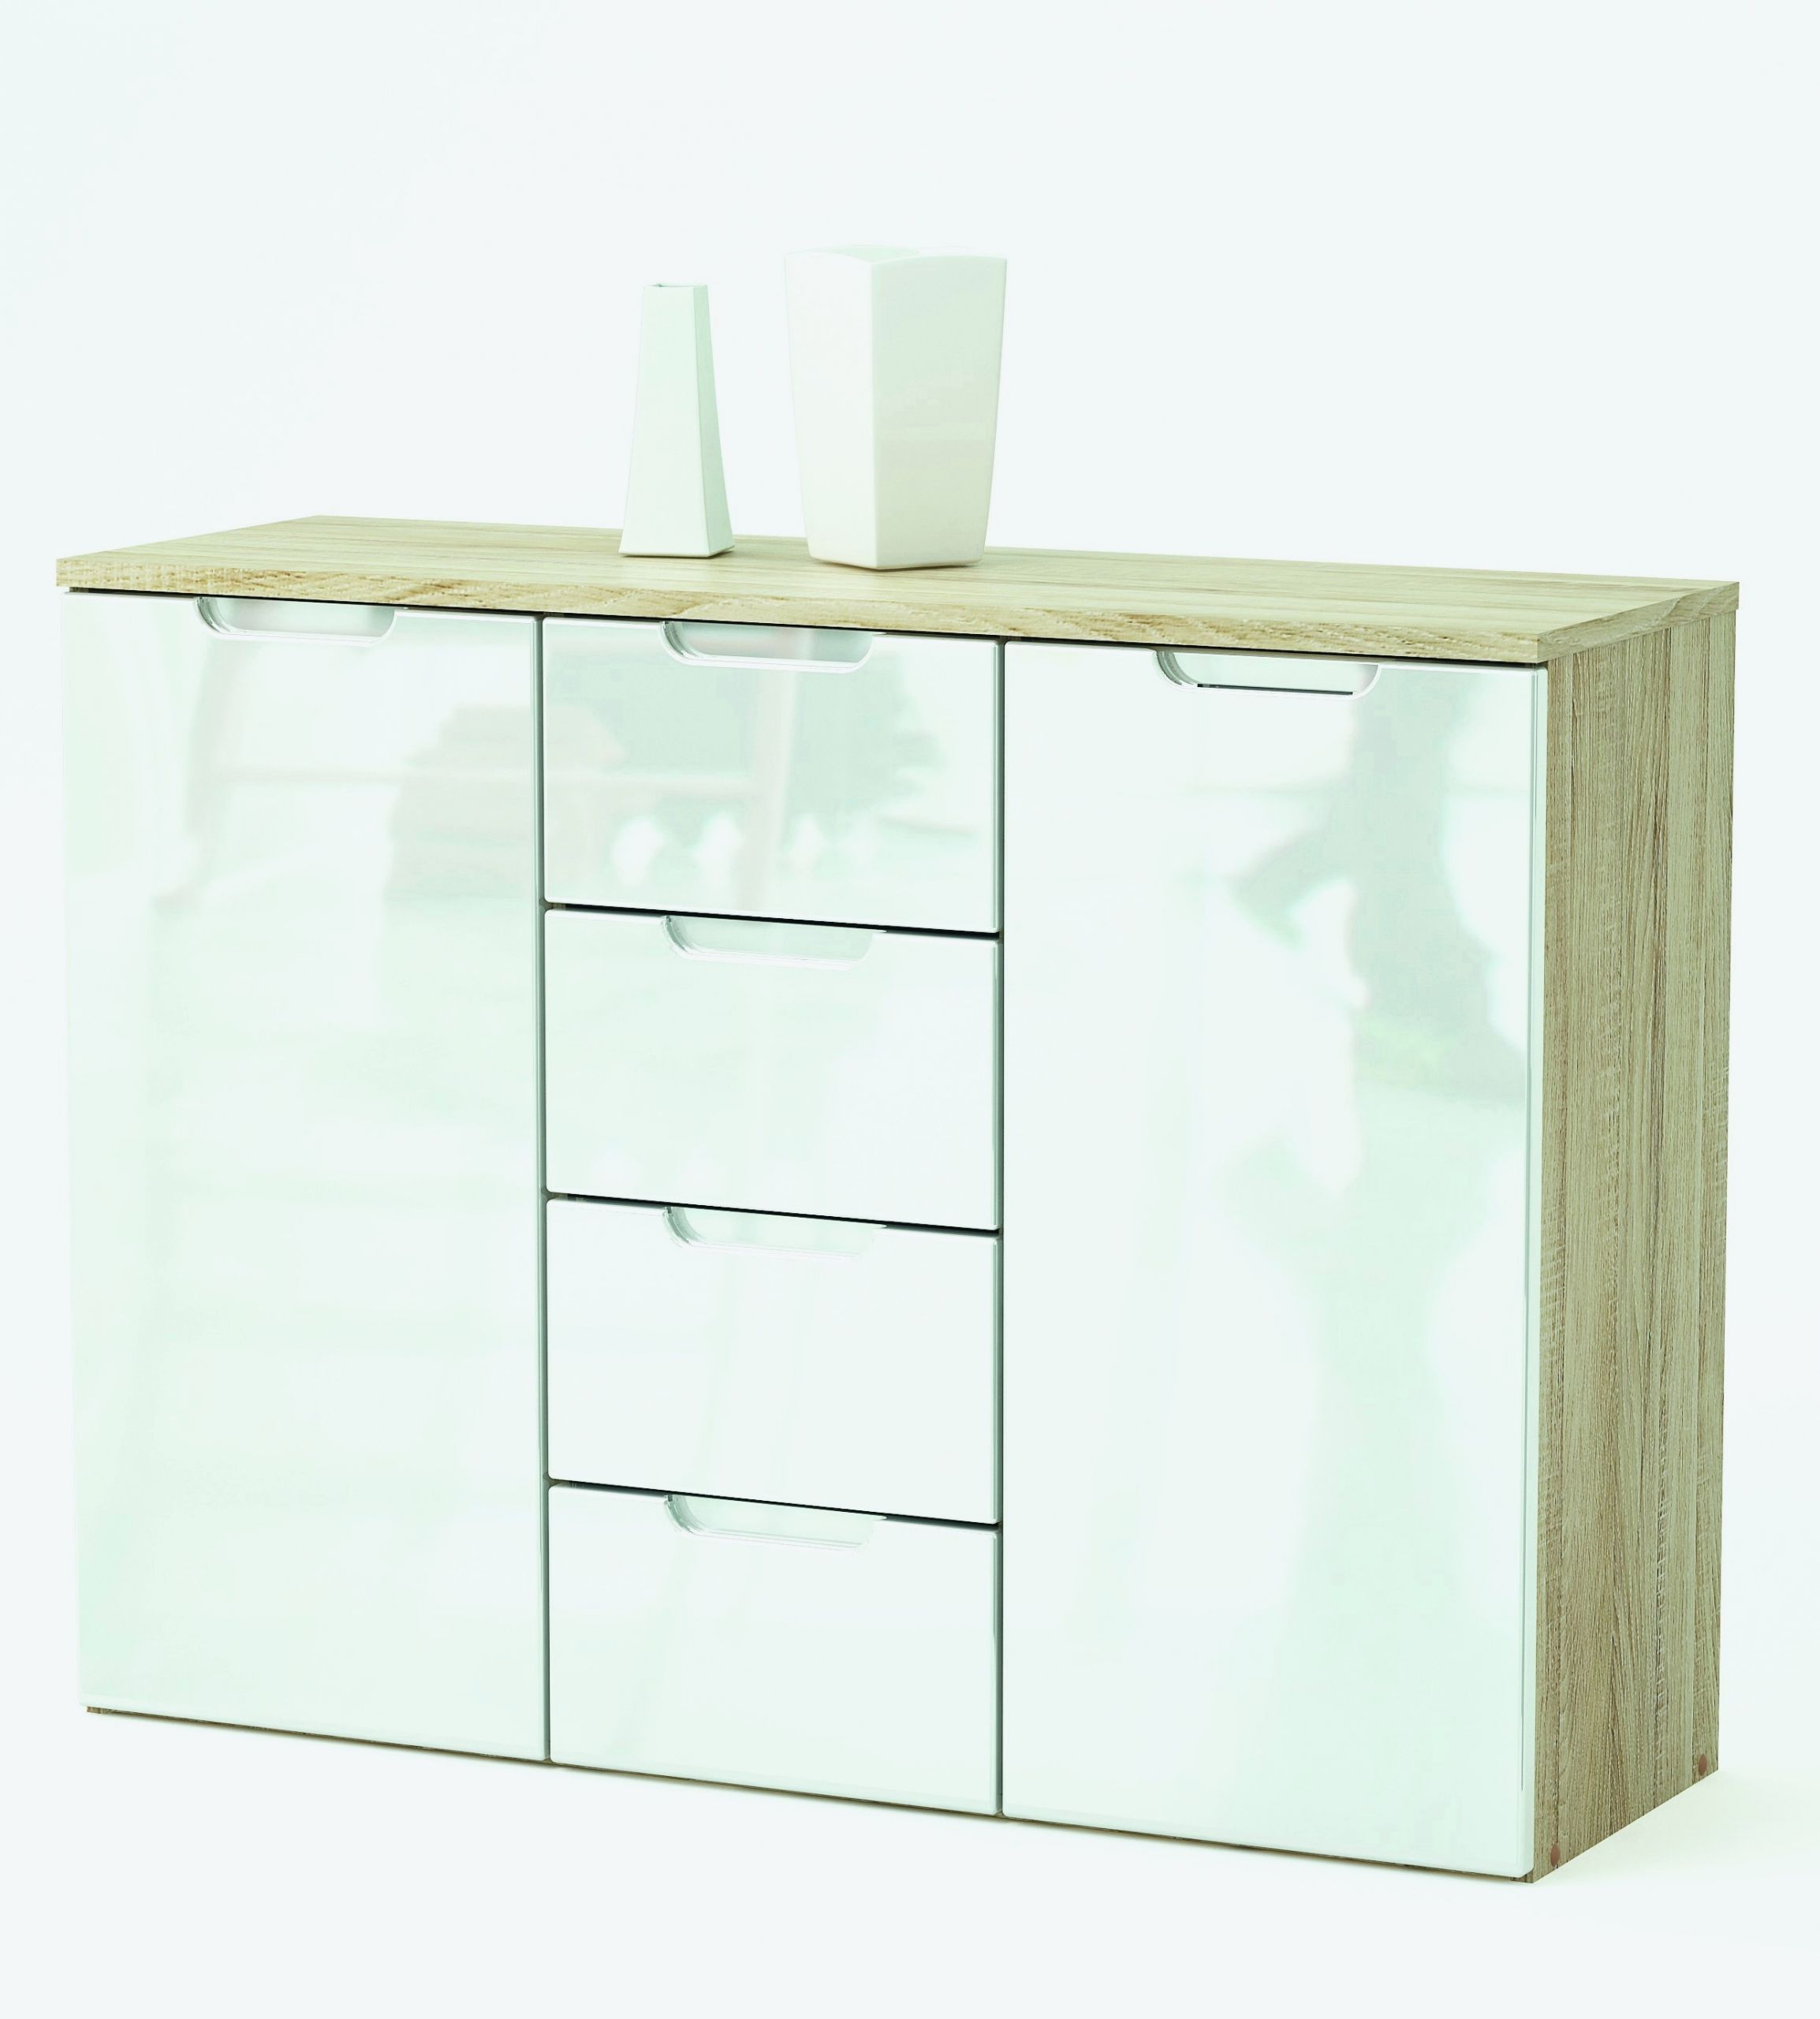 petit meuble bar meuble pour cuisine luxury petit meuble bas cuisine meilleur de of petit meuble bar